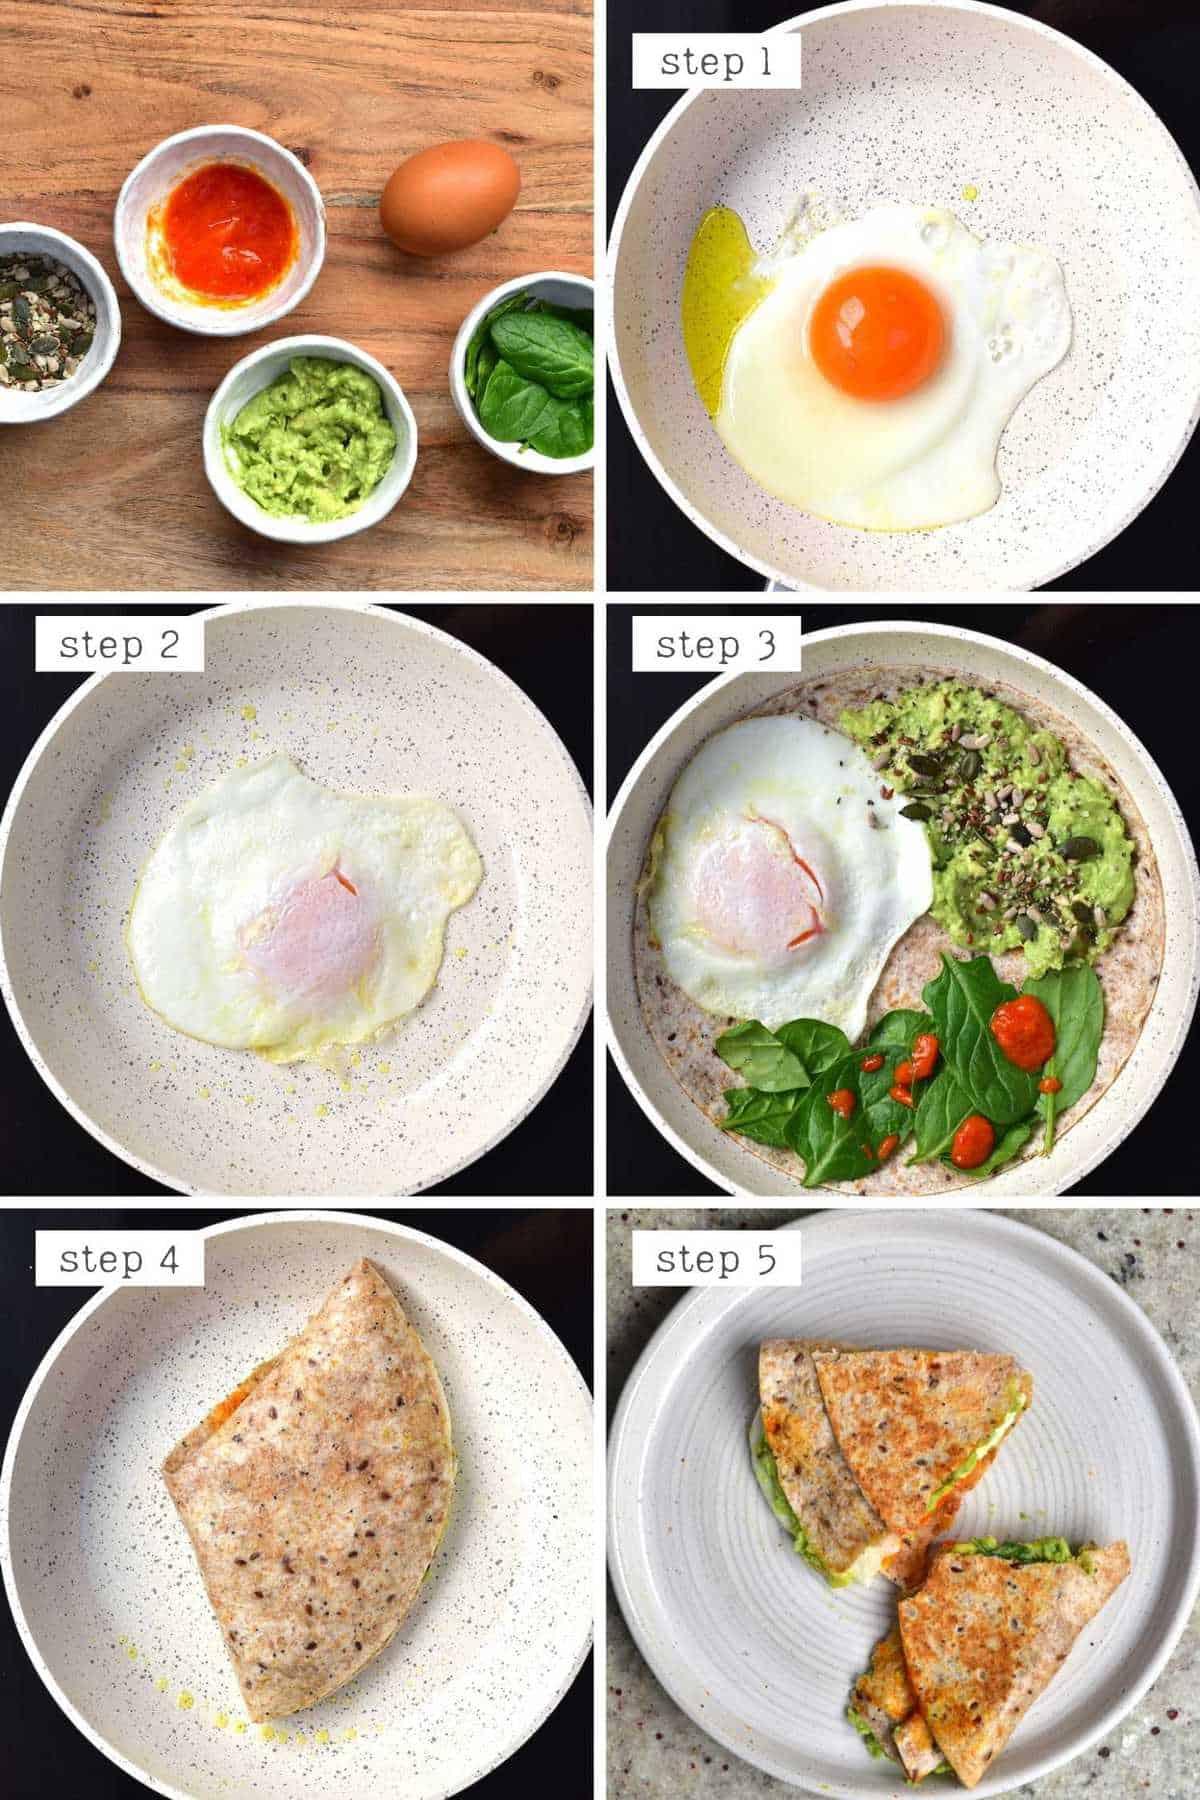 Steps for making fried egg breakfast quesadilla